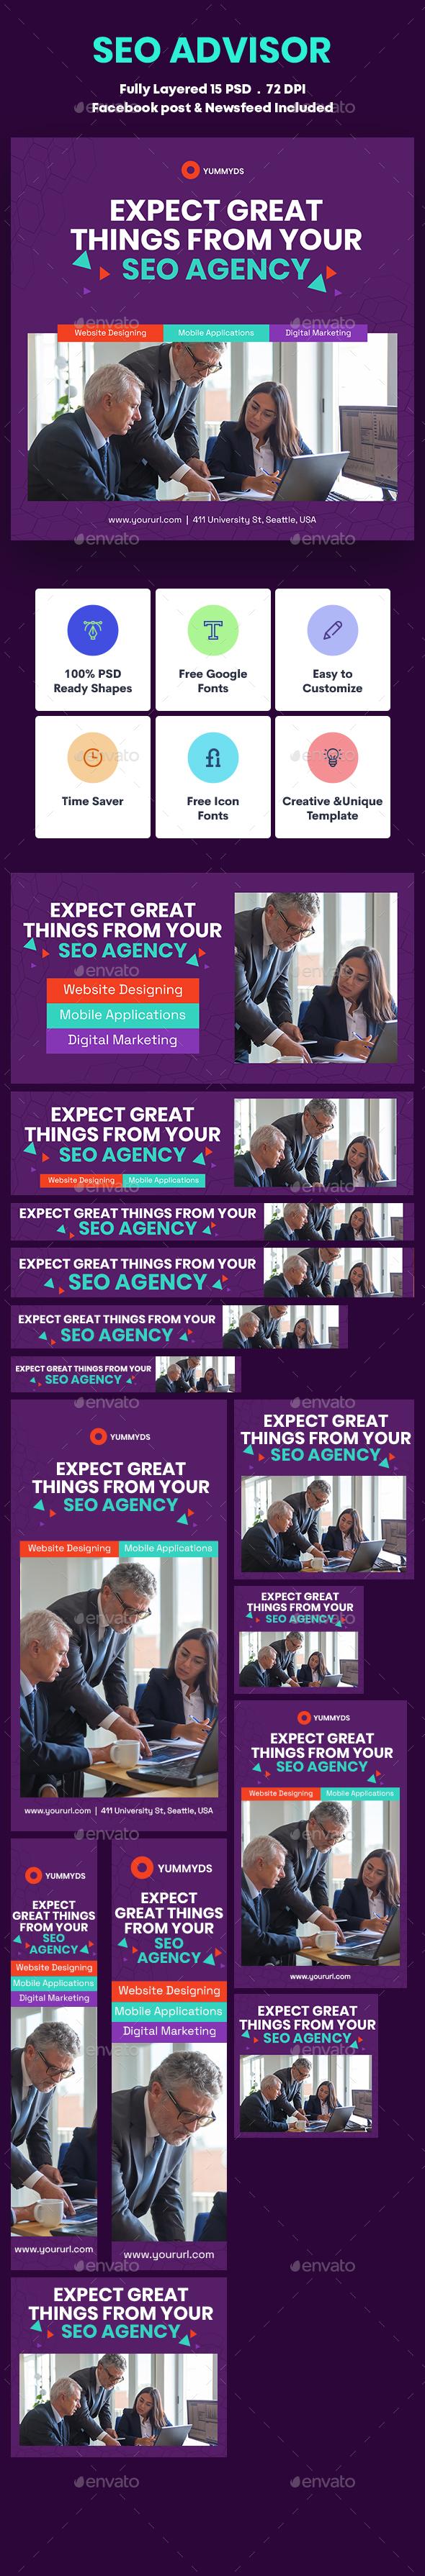 SEO Advisor Banners Ad